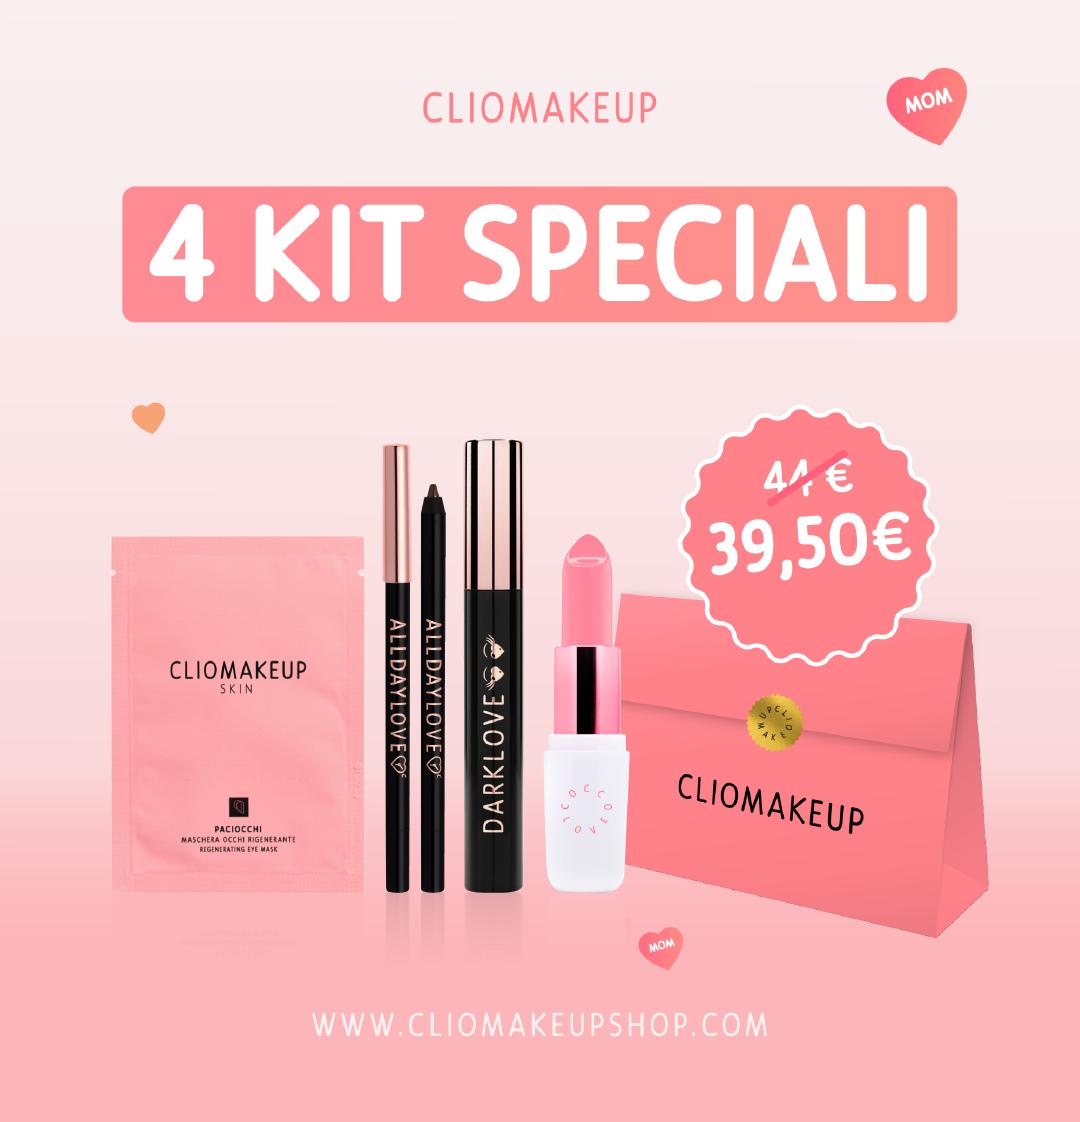 cliomakeup cliomakeupshop 4 kit speciali promo festa della mamma